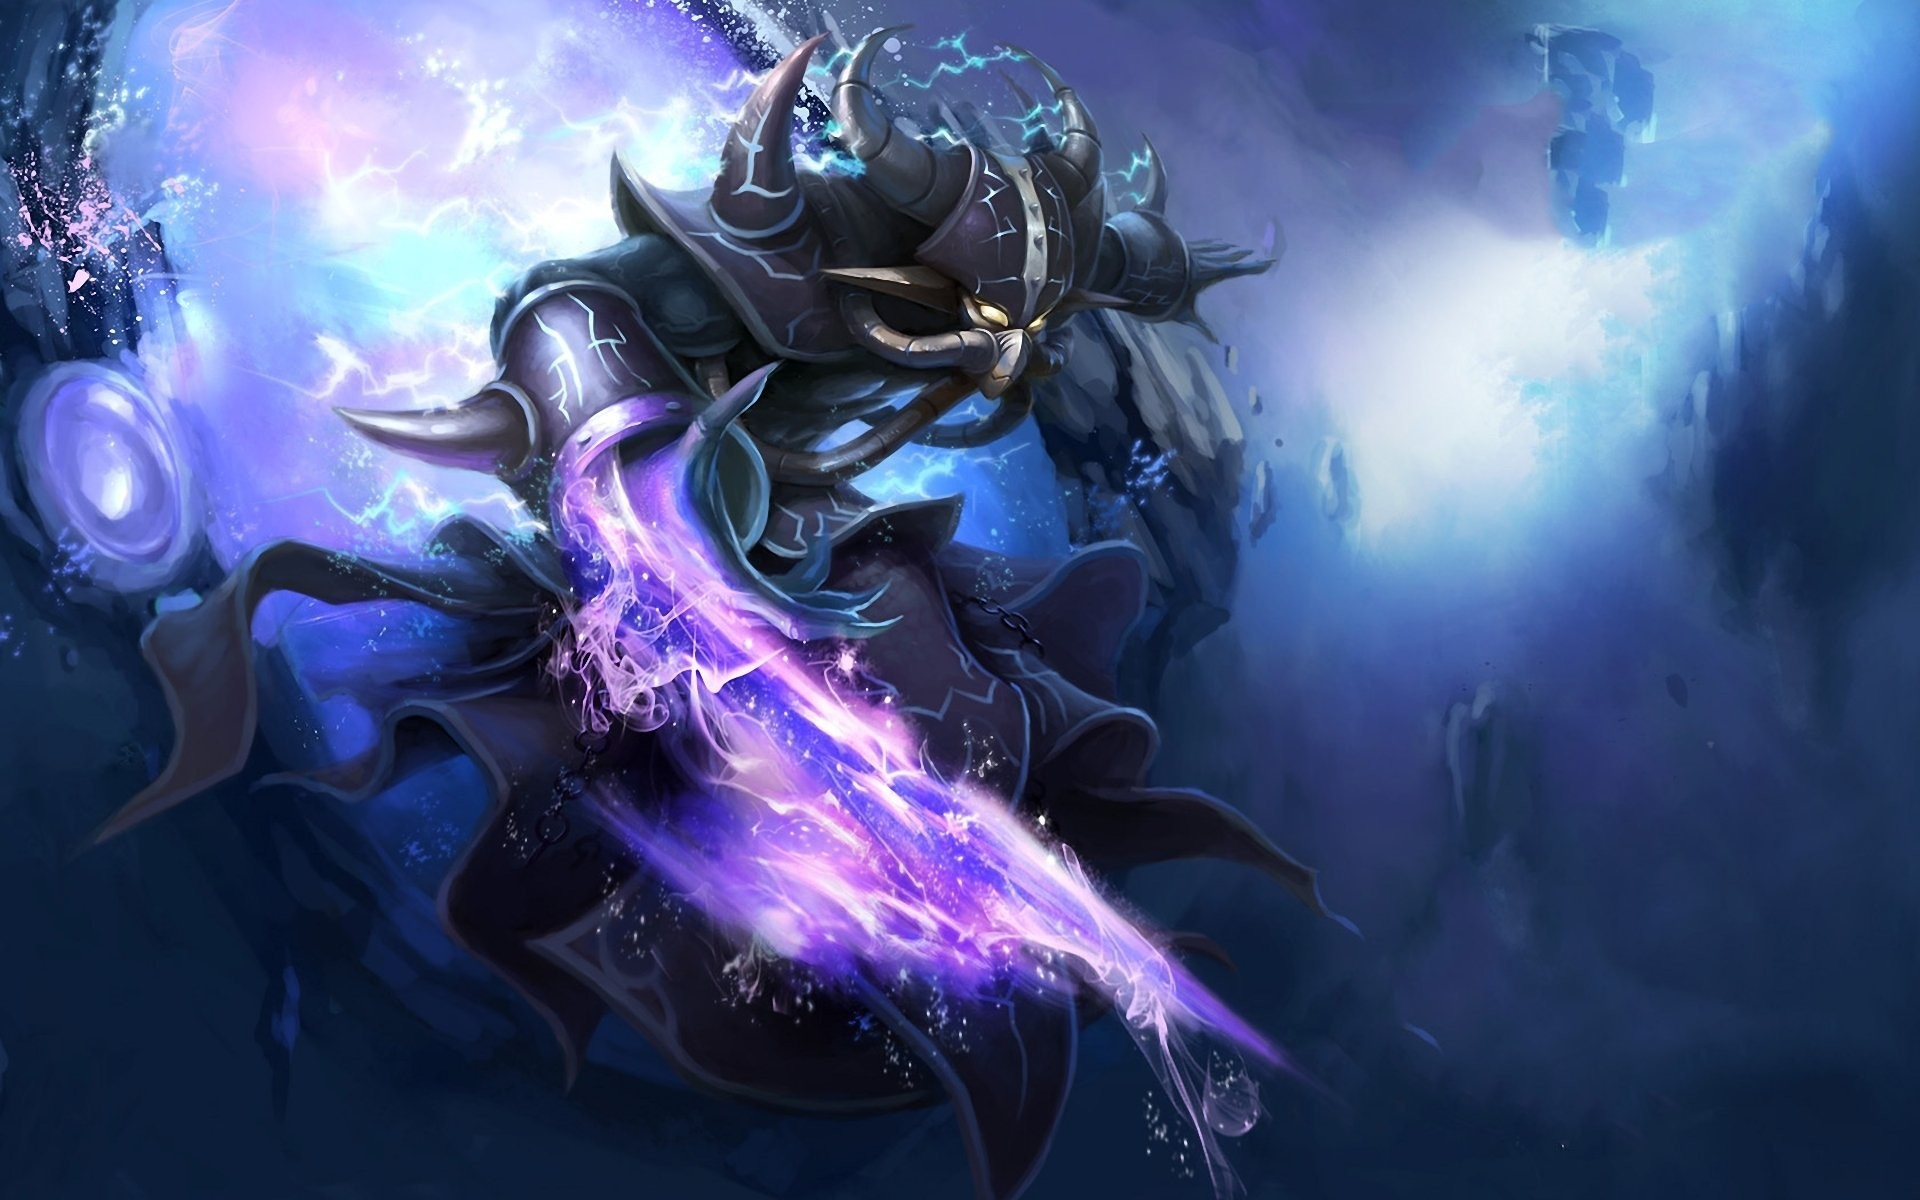 league of legends magic weapon lightning stones monster portal